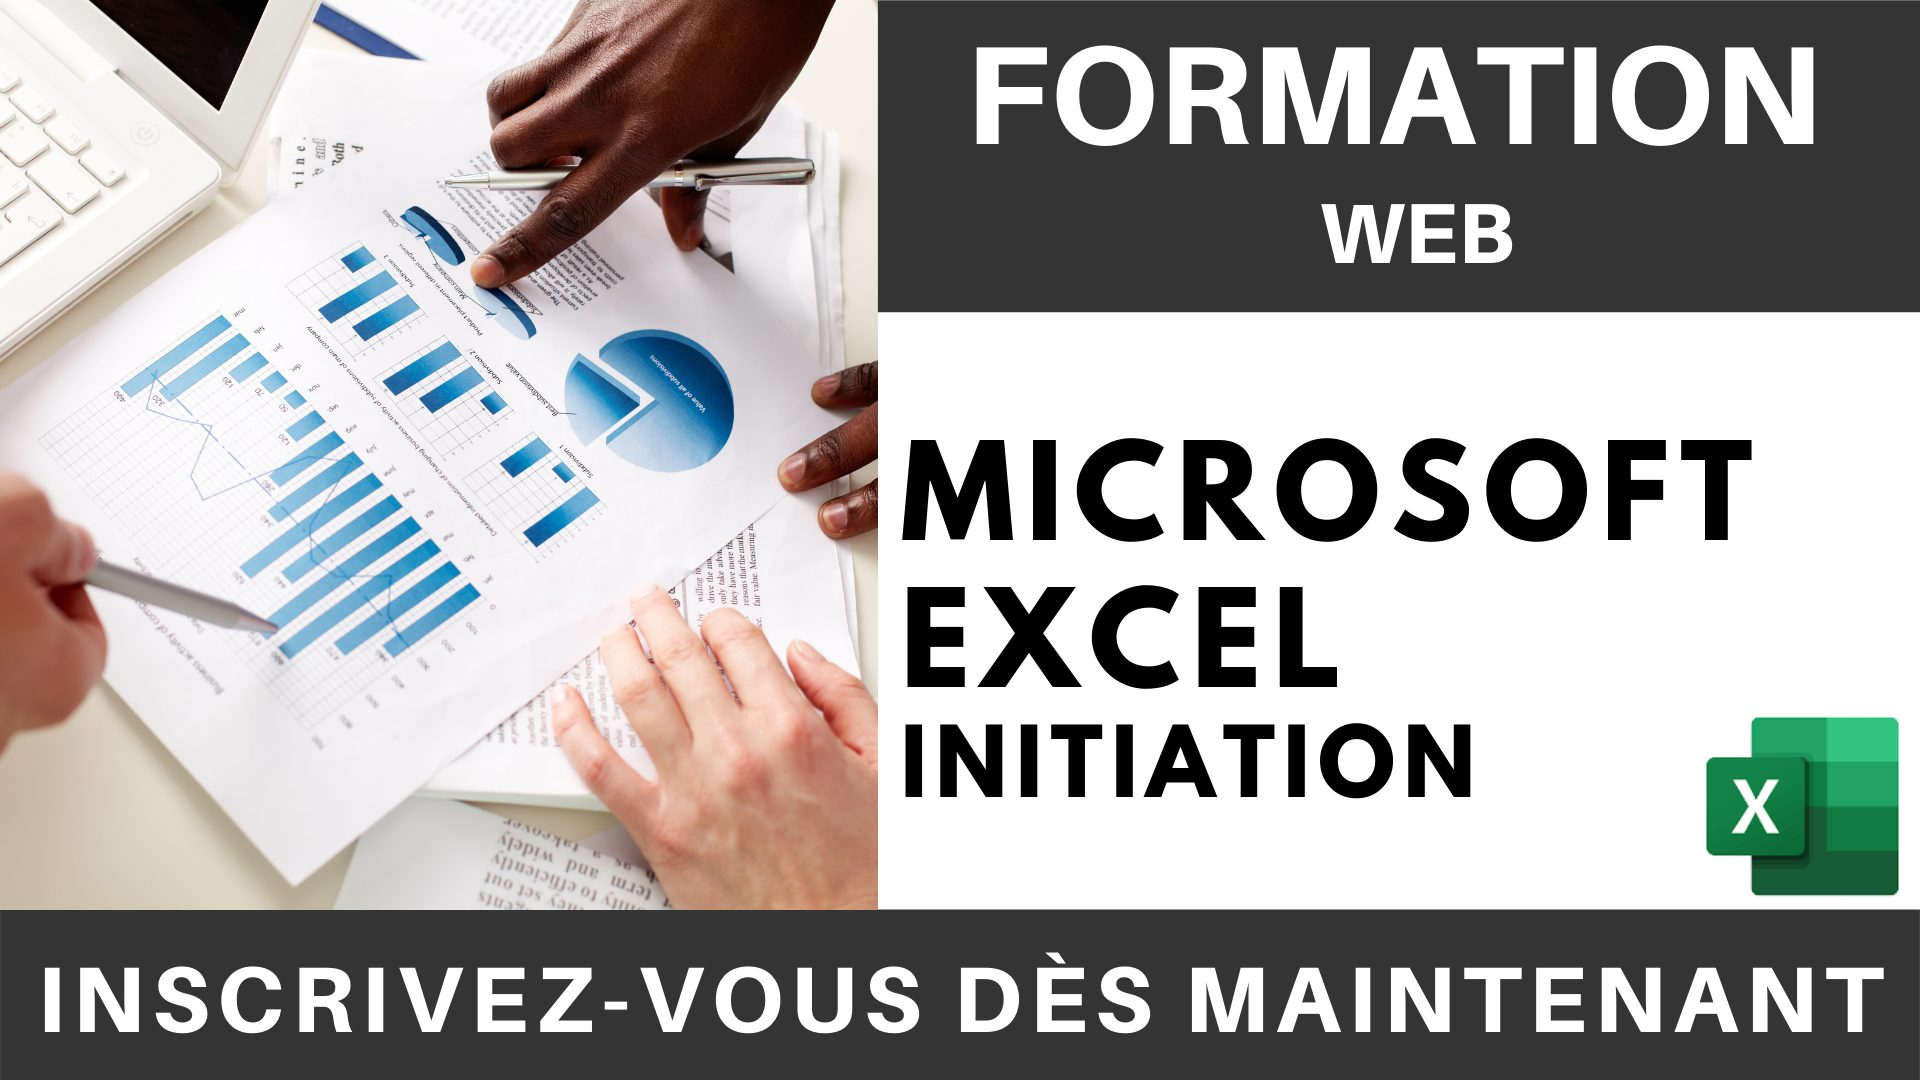 Formation LOGICIEL - Microsoft Excel Initiation